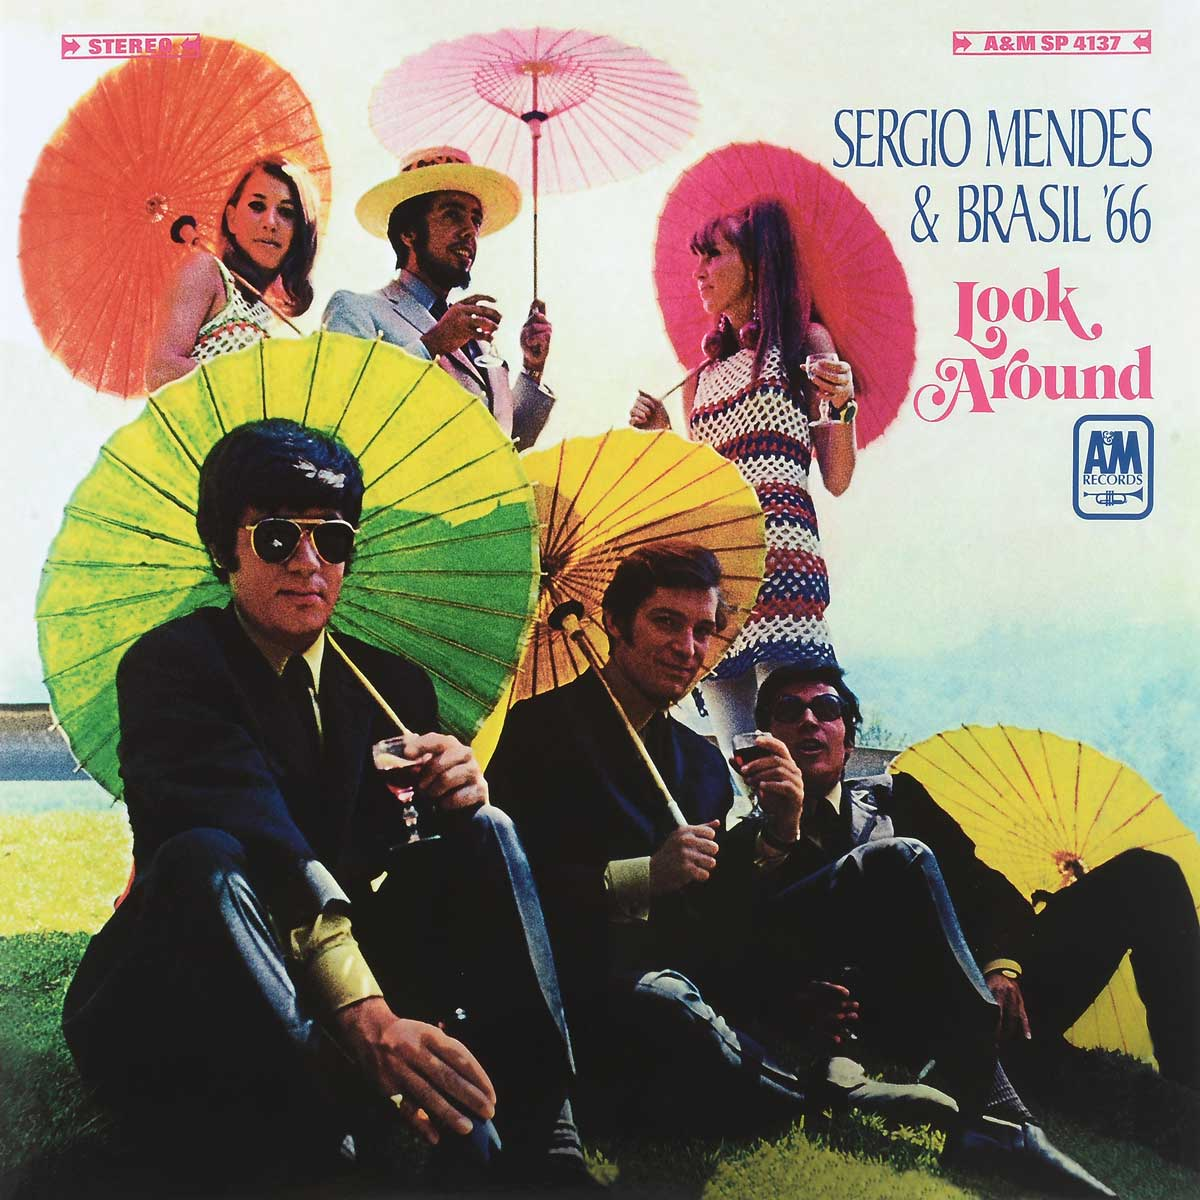 Сержио Мендес,Brasil '66 Sergio Mendes & Brasil '66. Look Around (LP) шон мендес shawn mendes handwritten